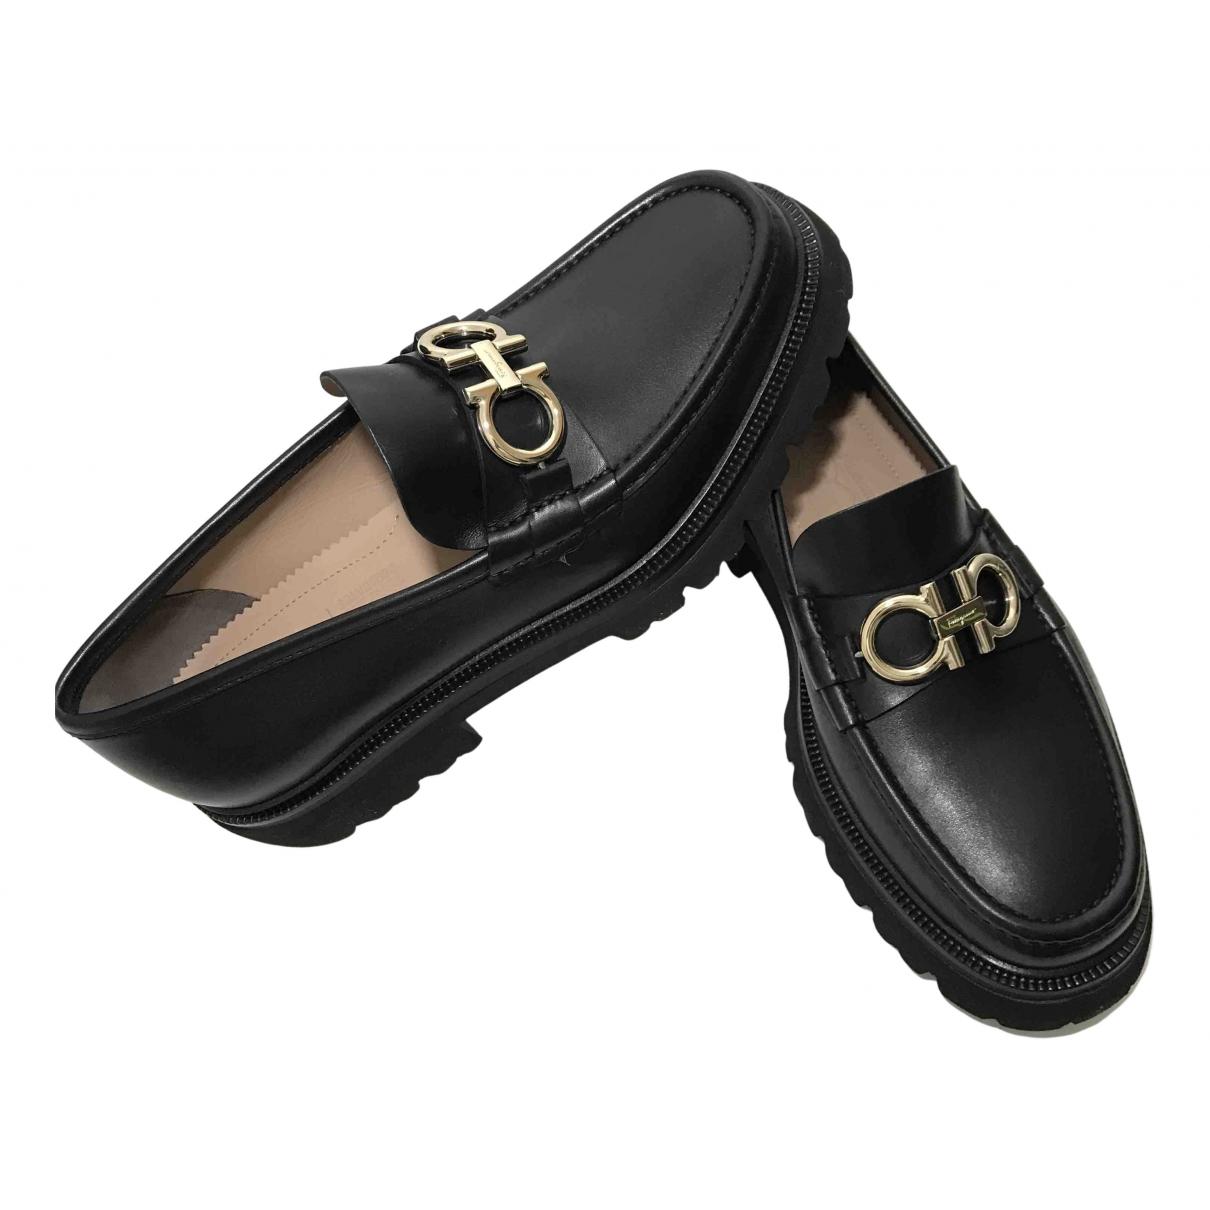 Salvatore Ferragamo Gancini Black Leather Flats for Men 7 US